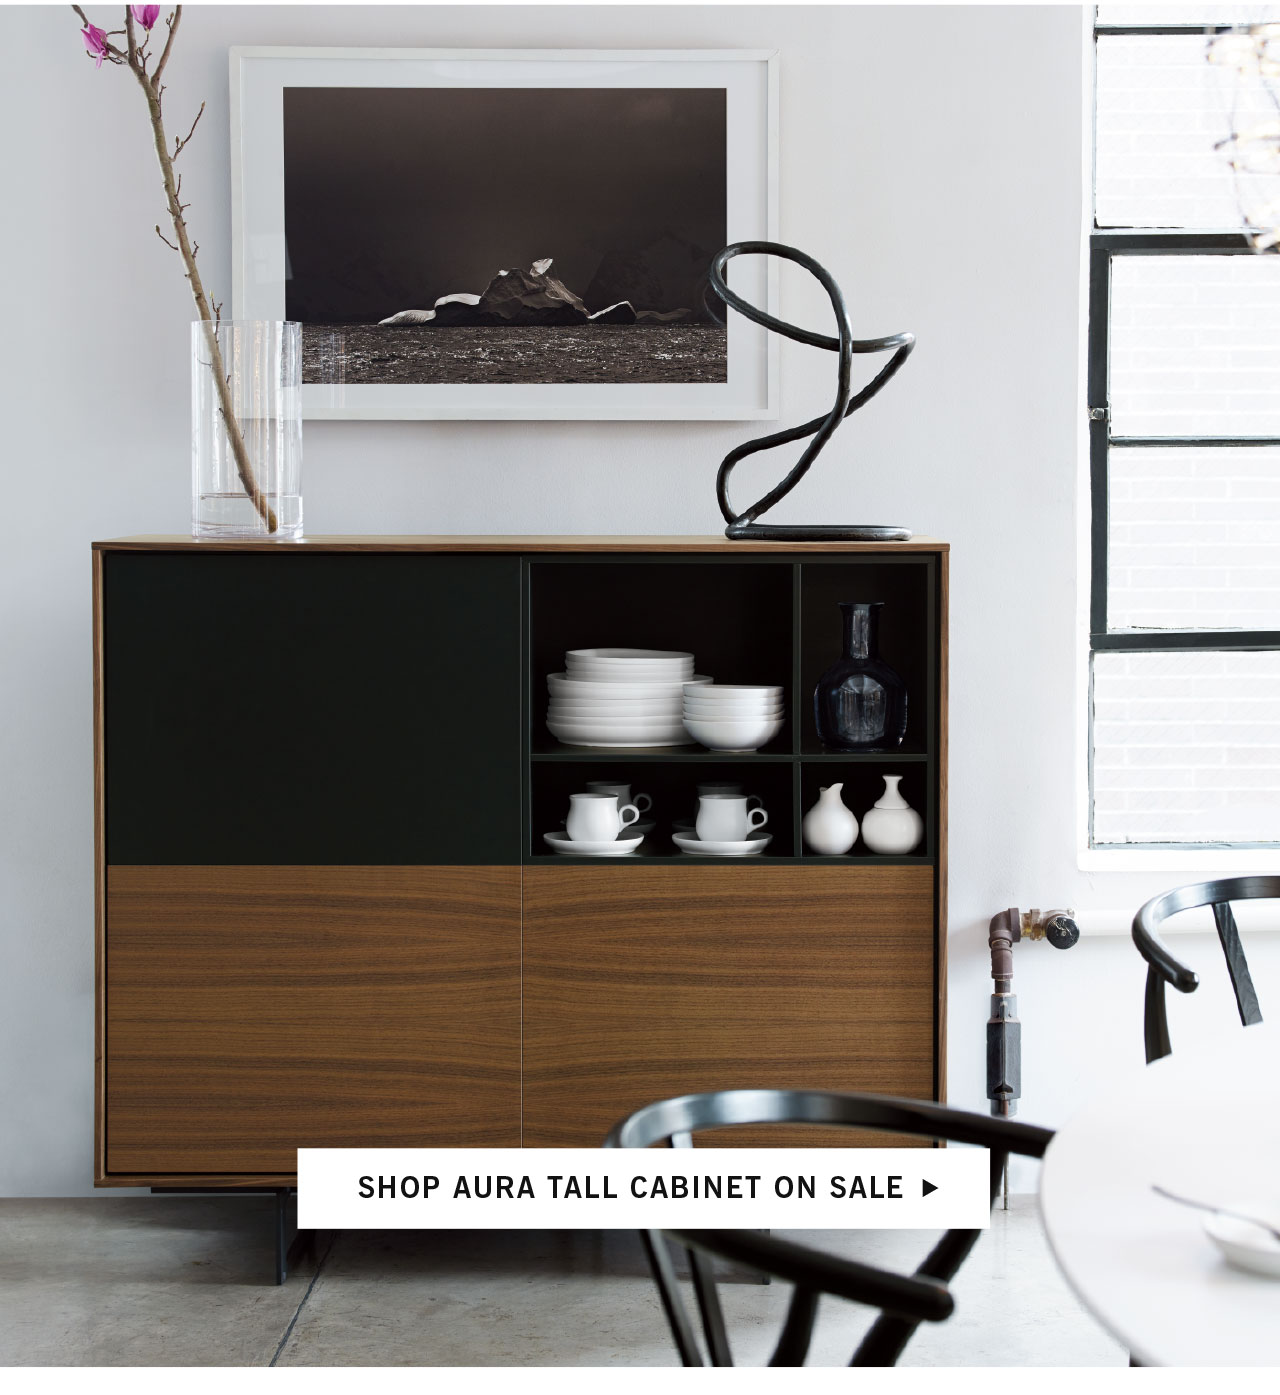 Aura Tall Cabinet on Sale